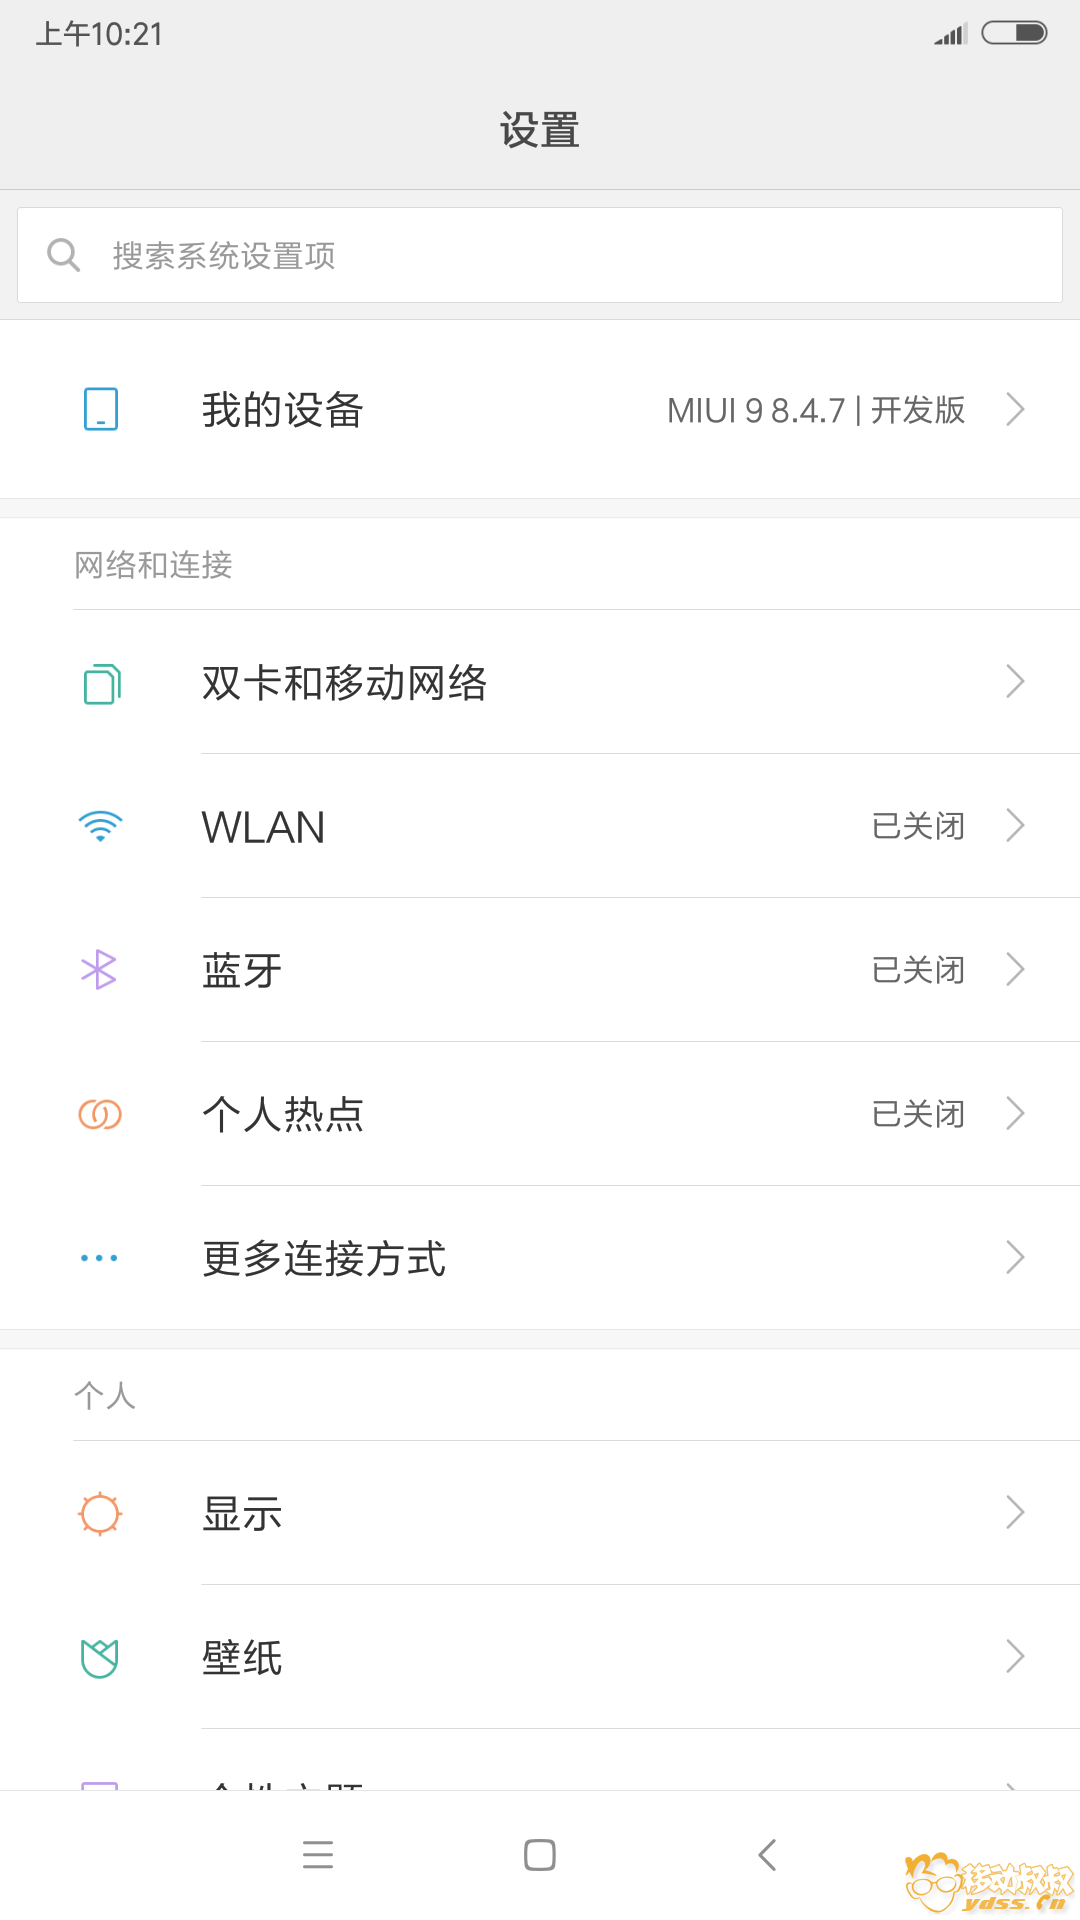 Screenshot_2018-04-07-10-21-08-793_com.android.settings.png